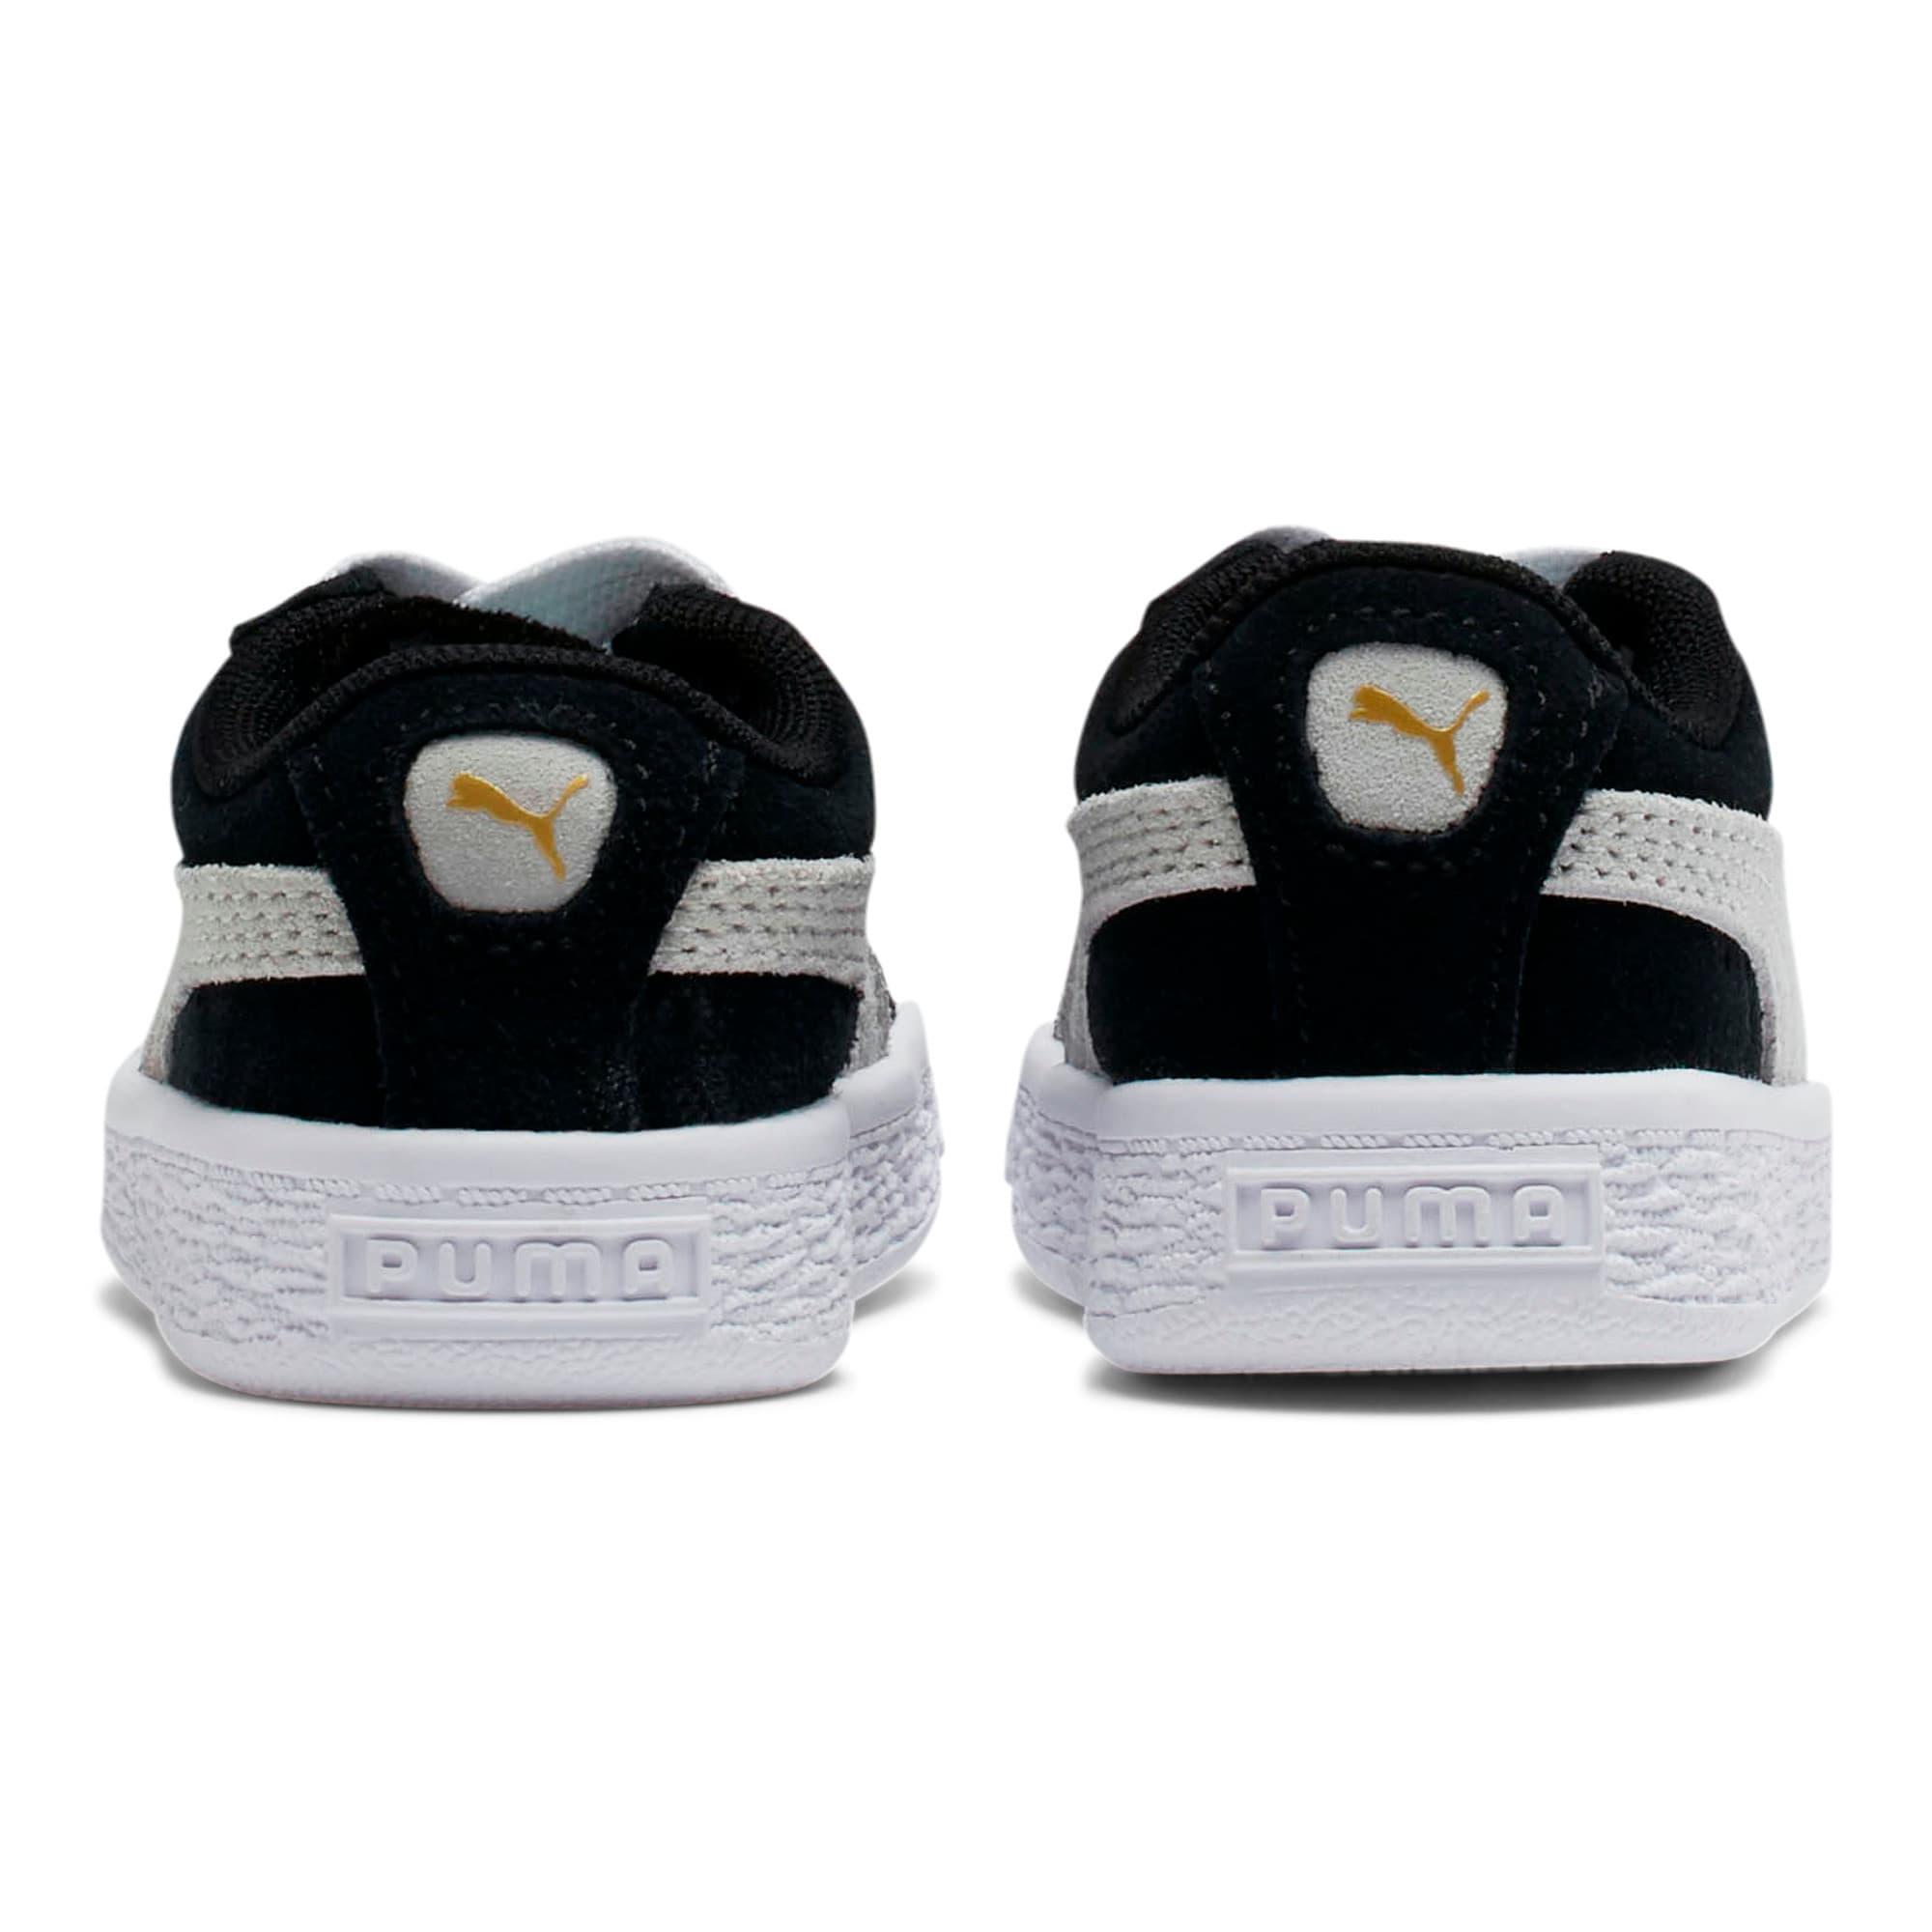 Thumbnail 4 of Puma Suede Toddler Shoes, black-white, medium